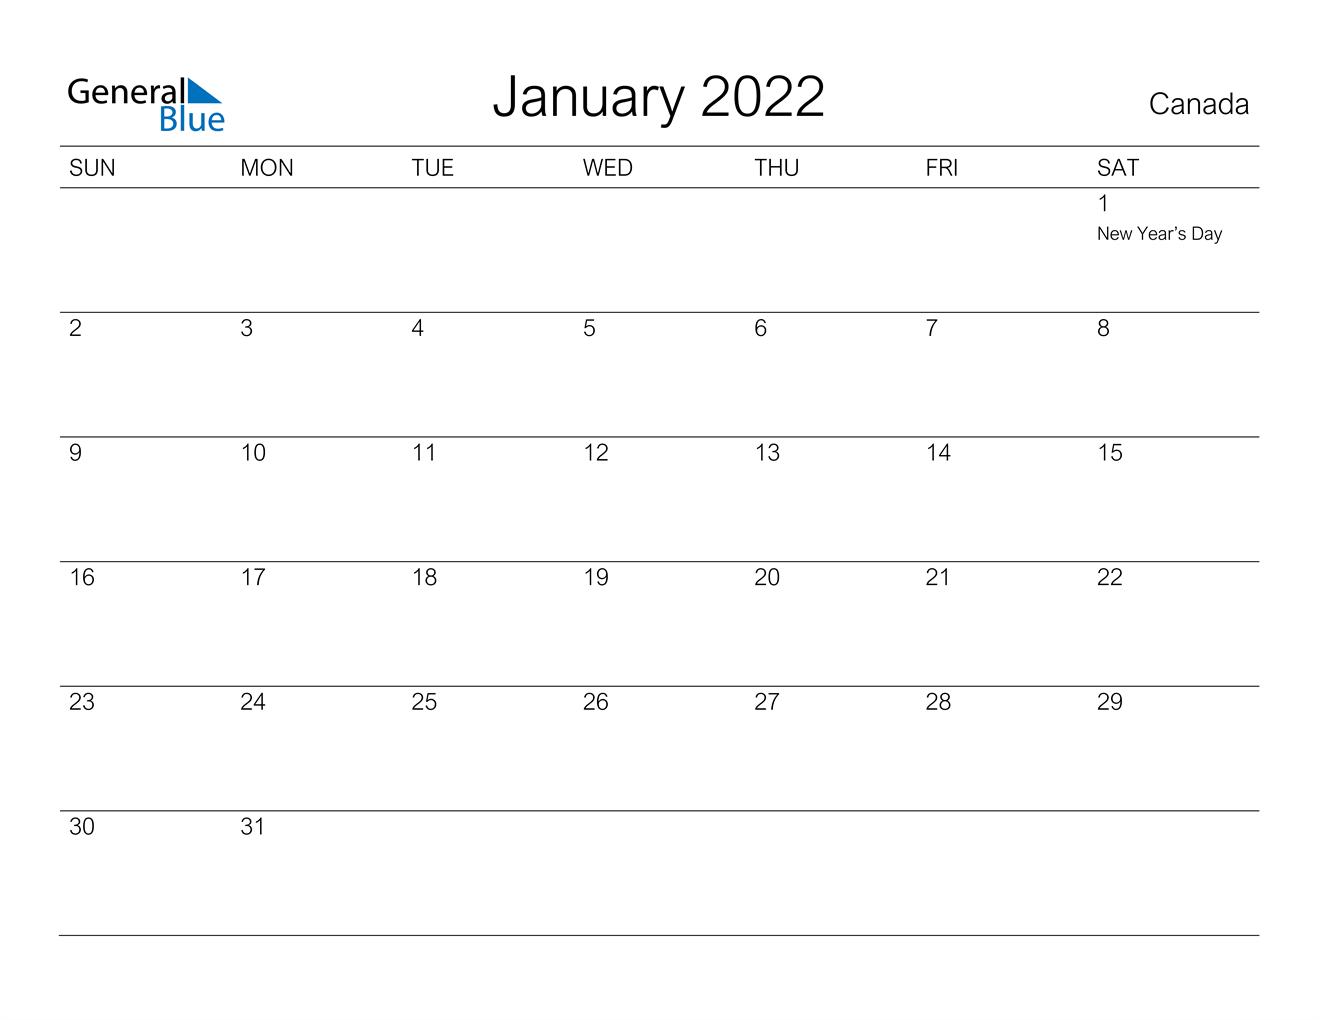 Canada January 2022 Calendar with Holidays